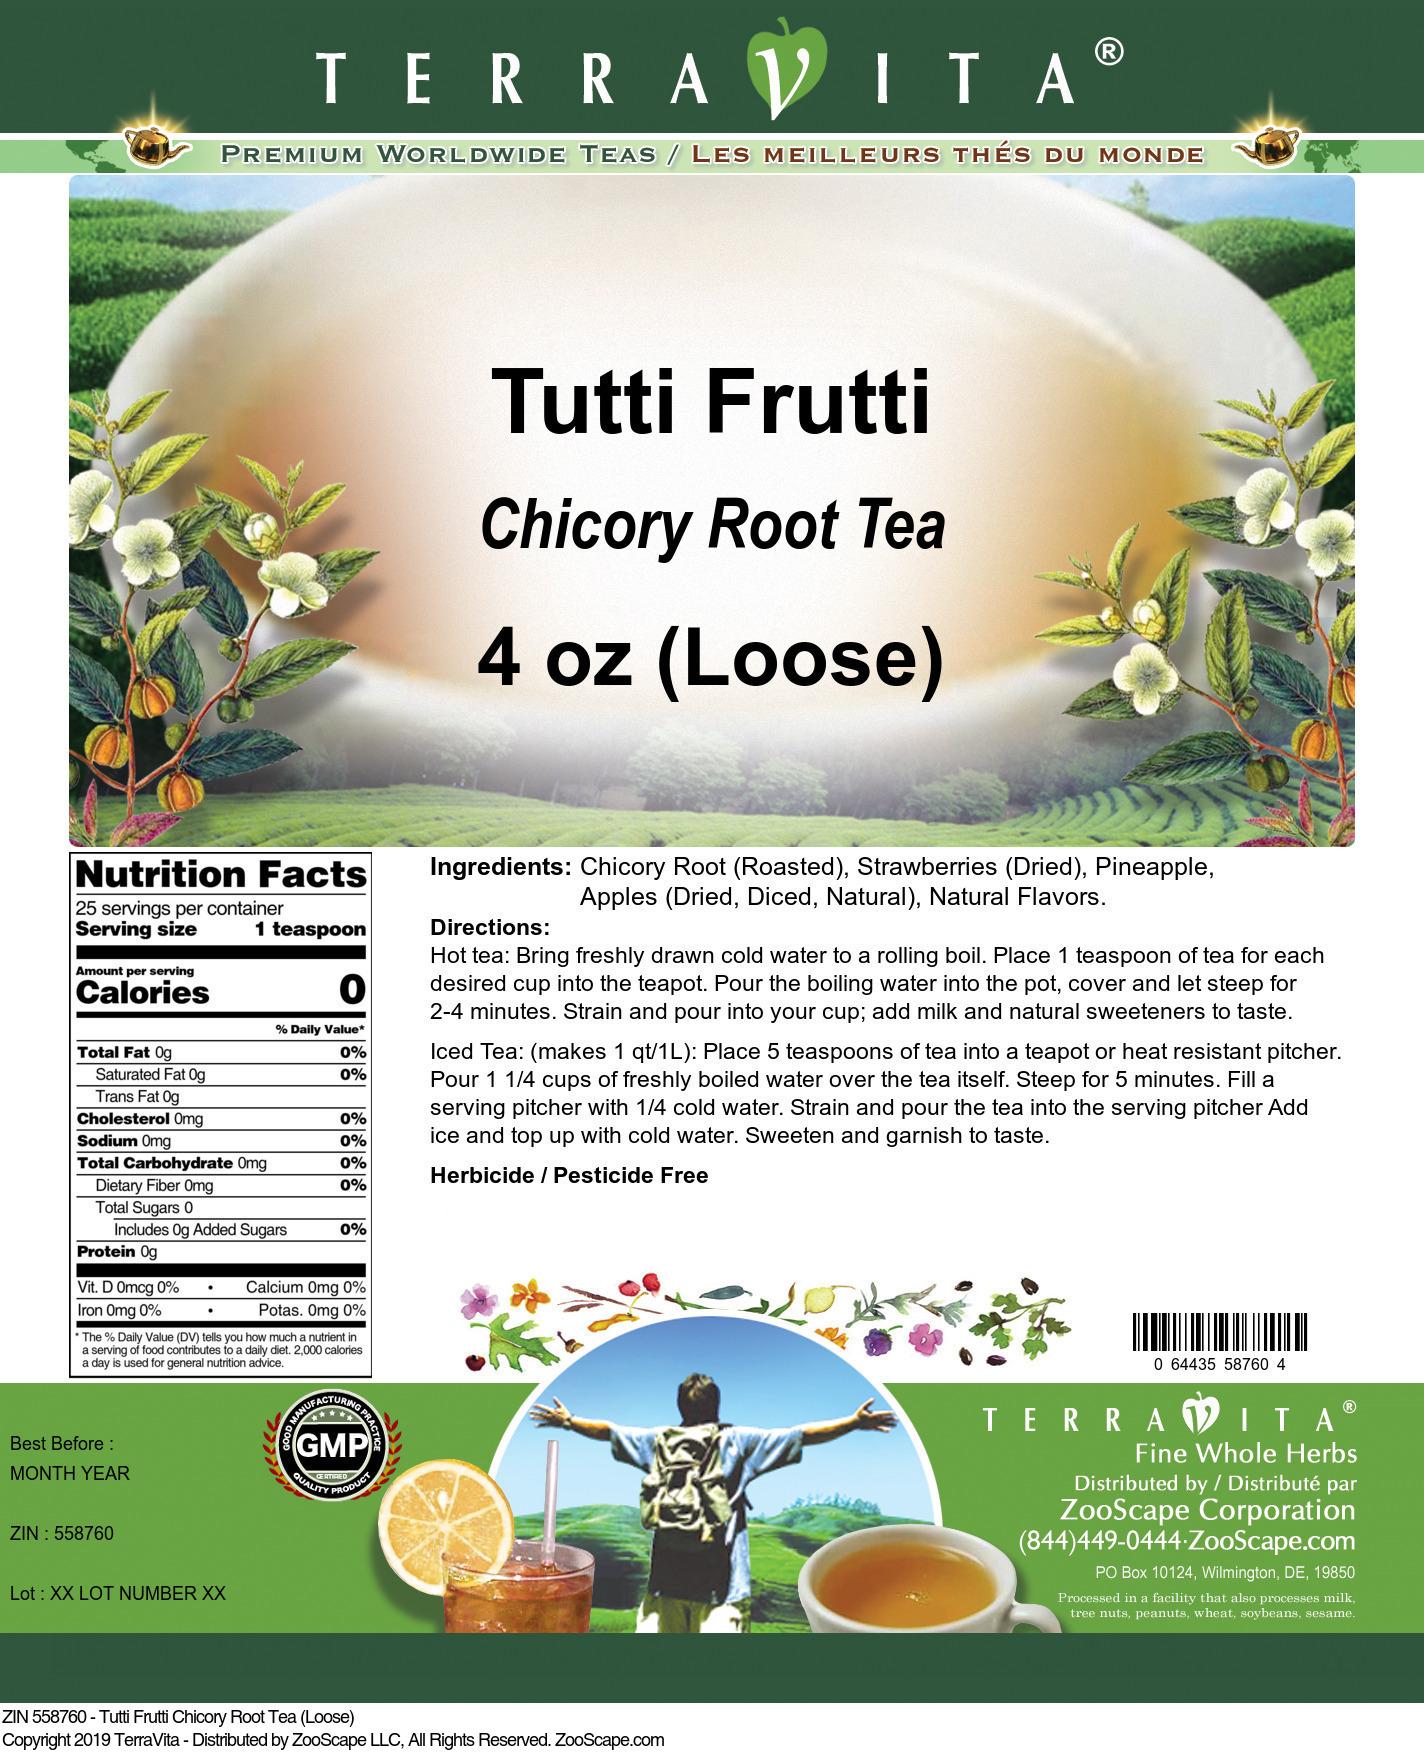 Tutti Frutti Chicory Root Tea (Loose)